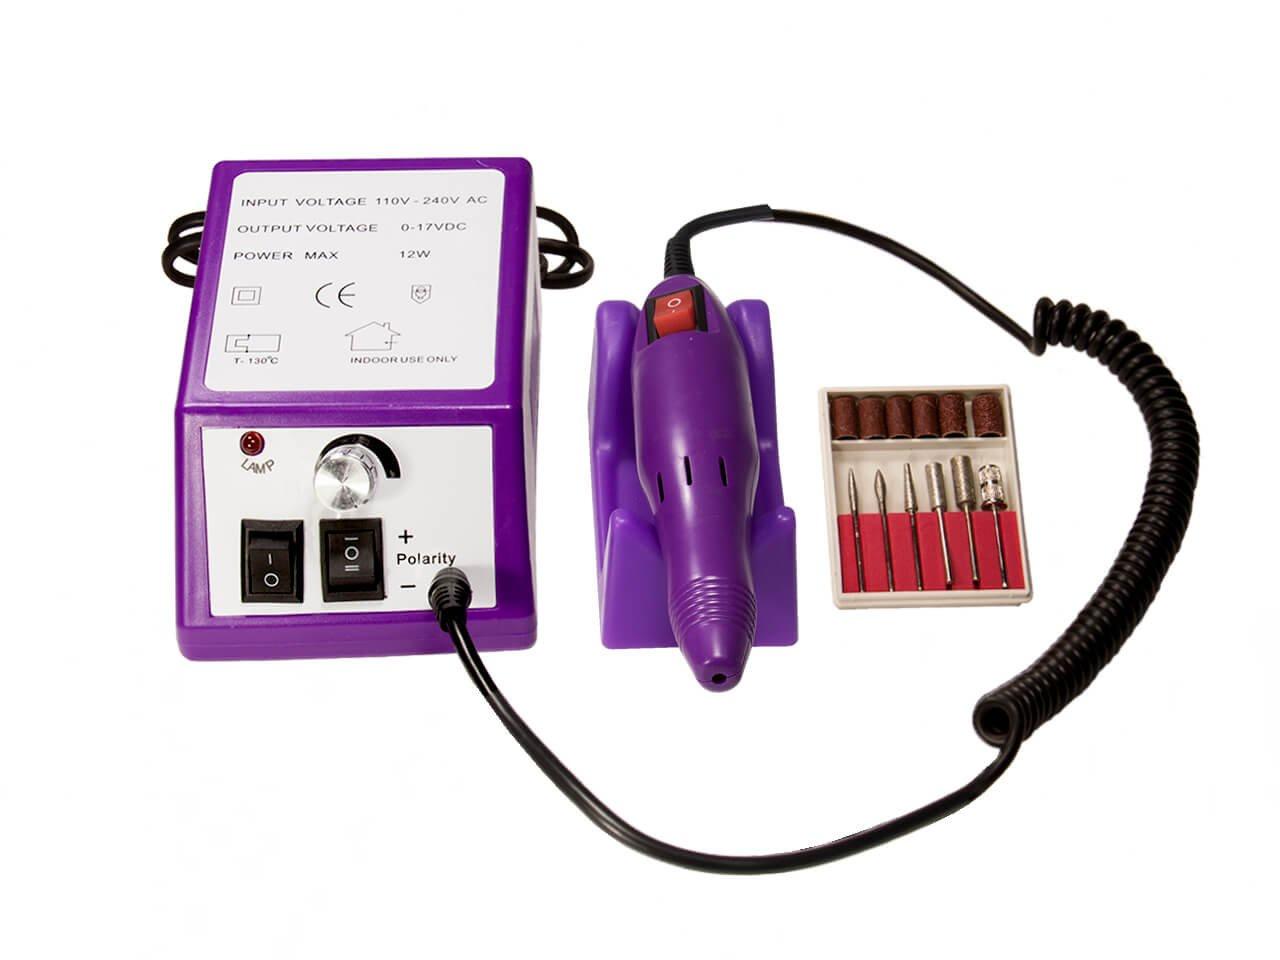 Аппарат для маникюра и педикюра Lina Mercedes 2000 Lina Purple аппарат для маникюра и педикюра smile mpss 3403